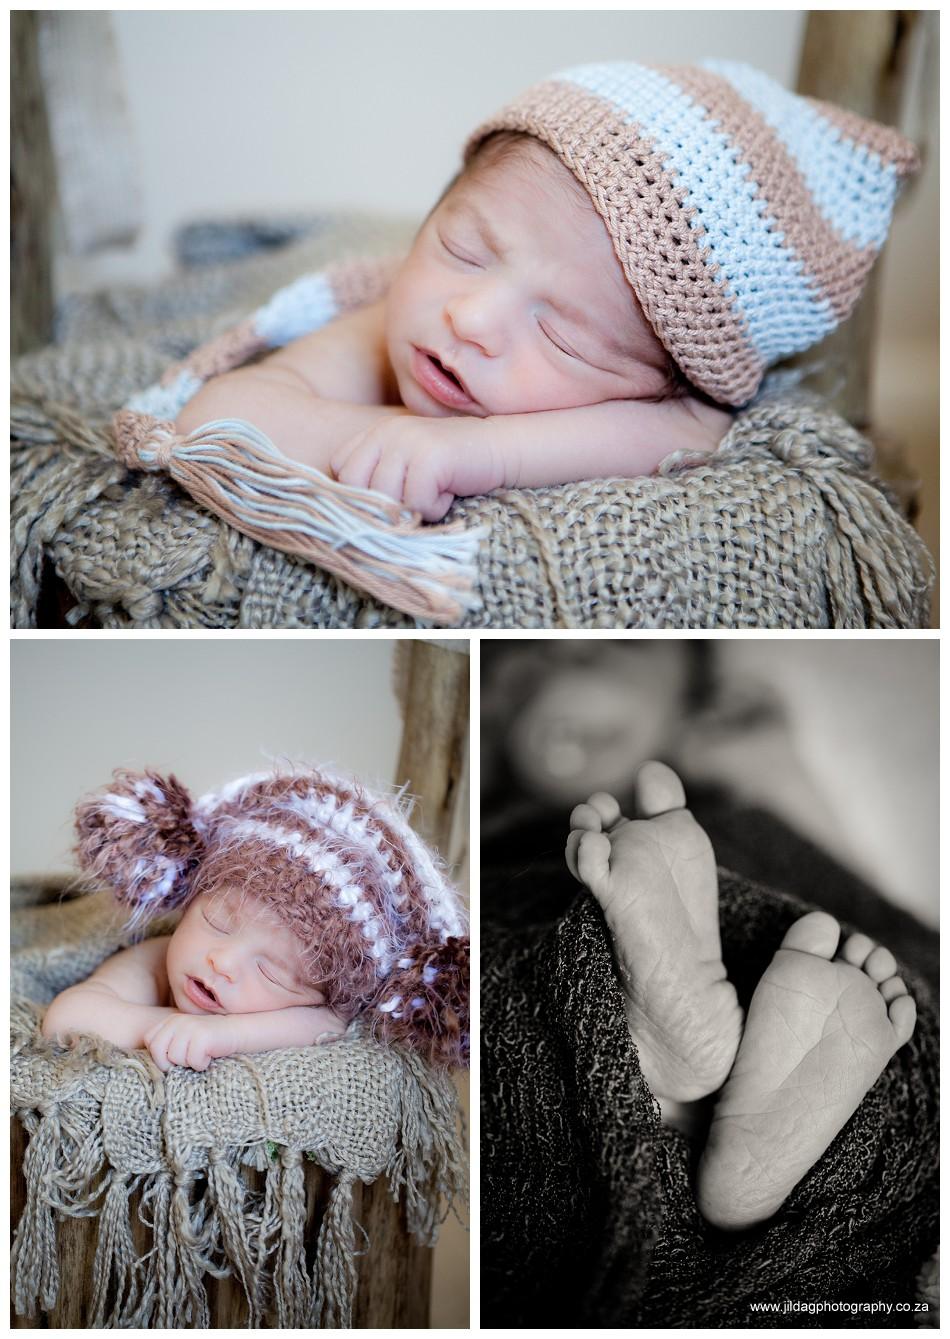 Newborn studio photography - Jilda G Photography - Durbanville (21)